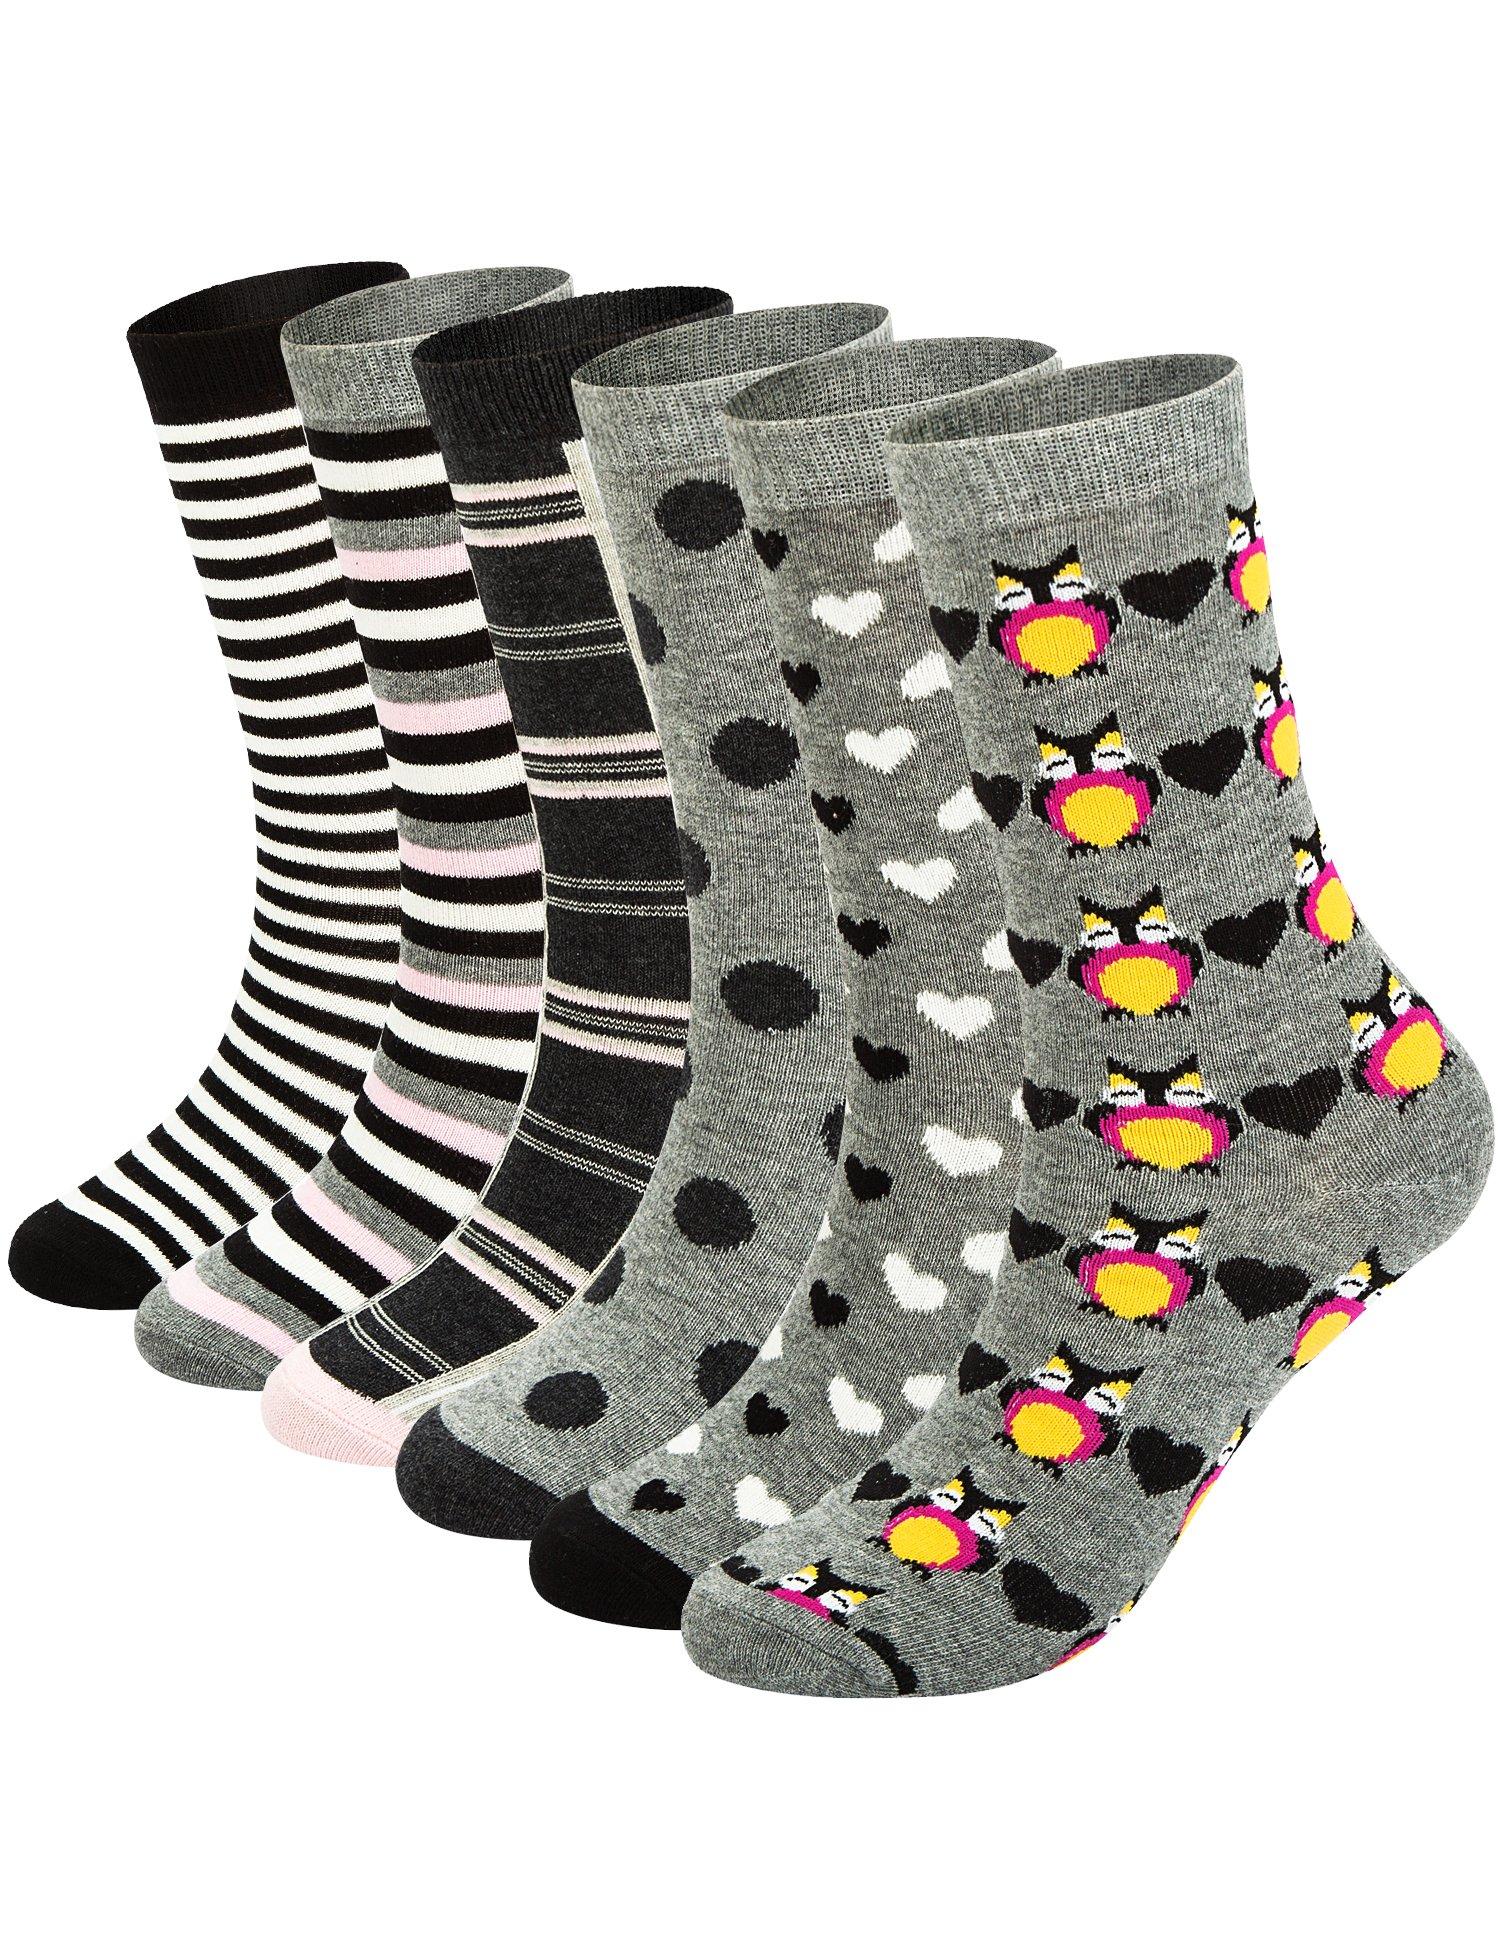 6 Pairs Womens Cotton Fun Crew Socks,Casual Animal,Striped,Polka Dot Printed, O/S